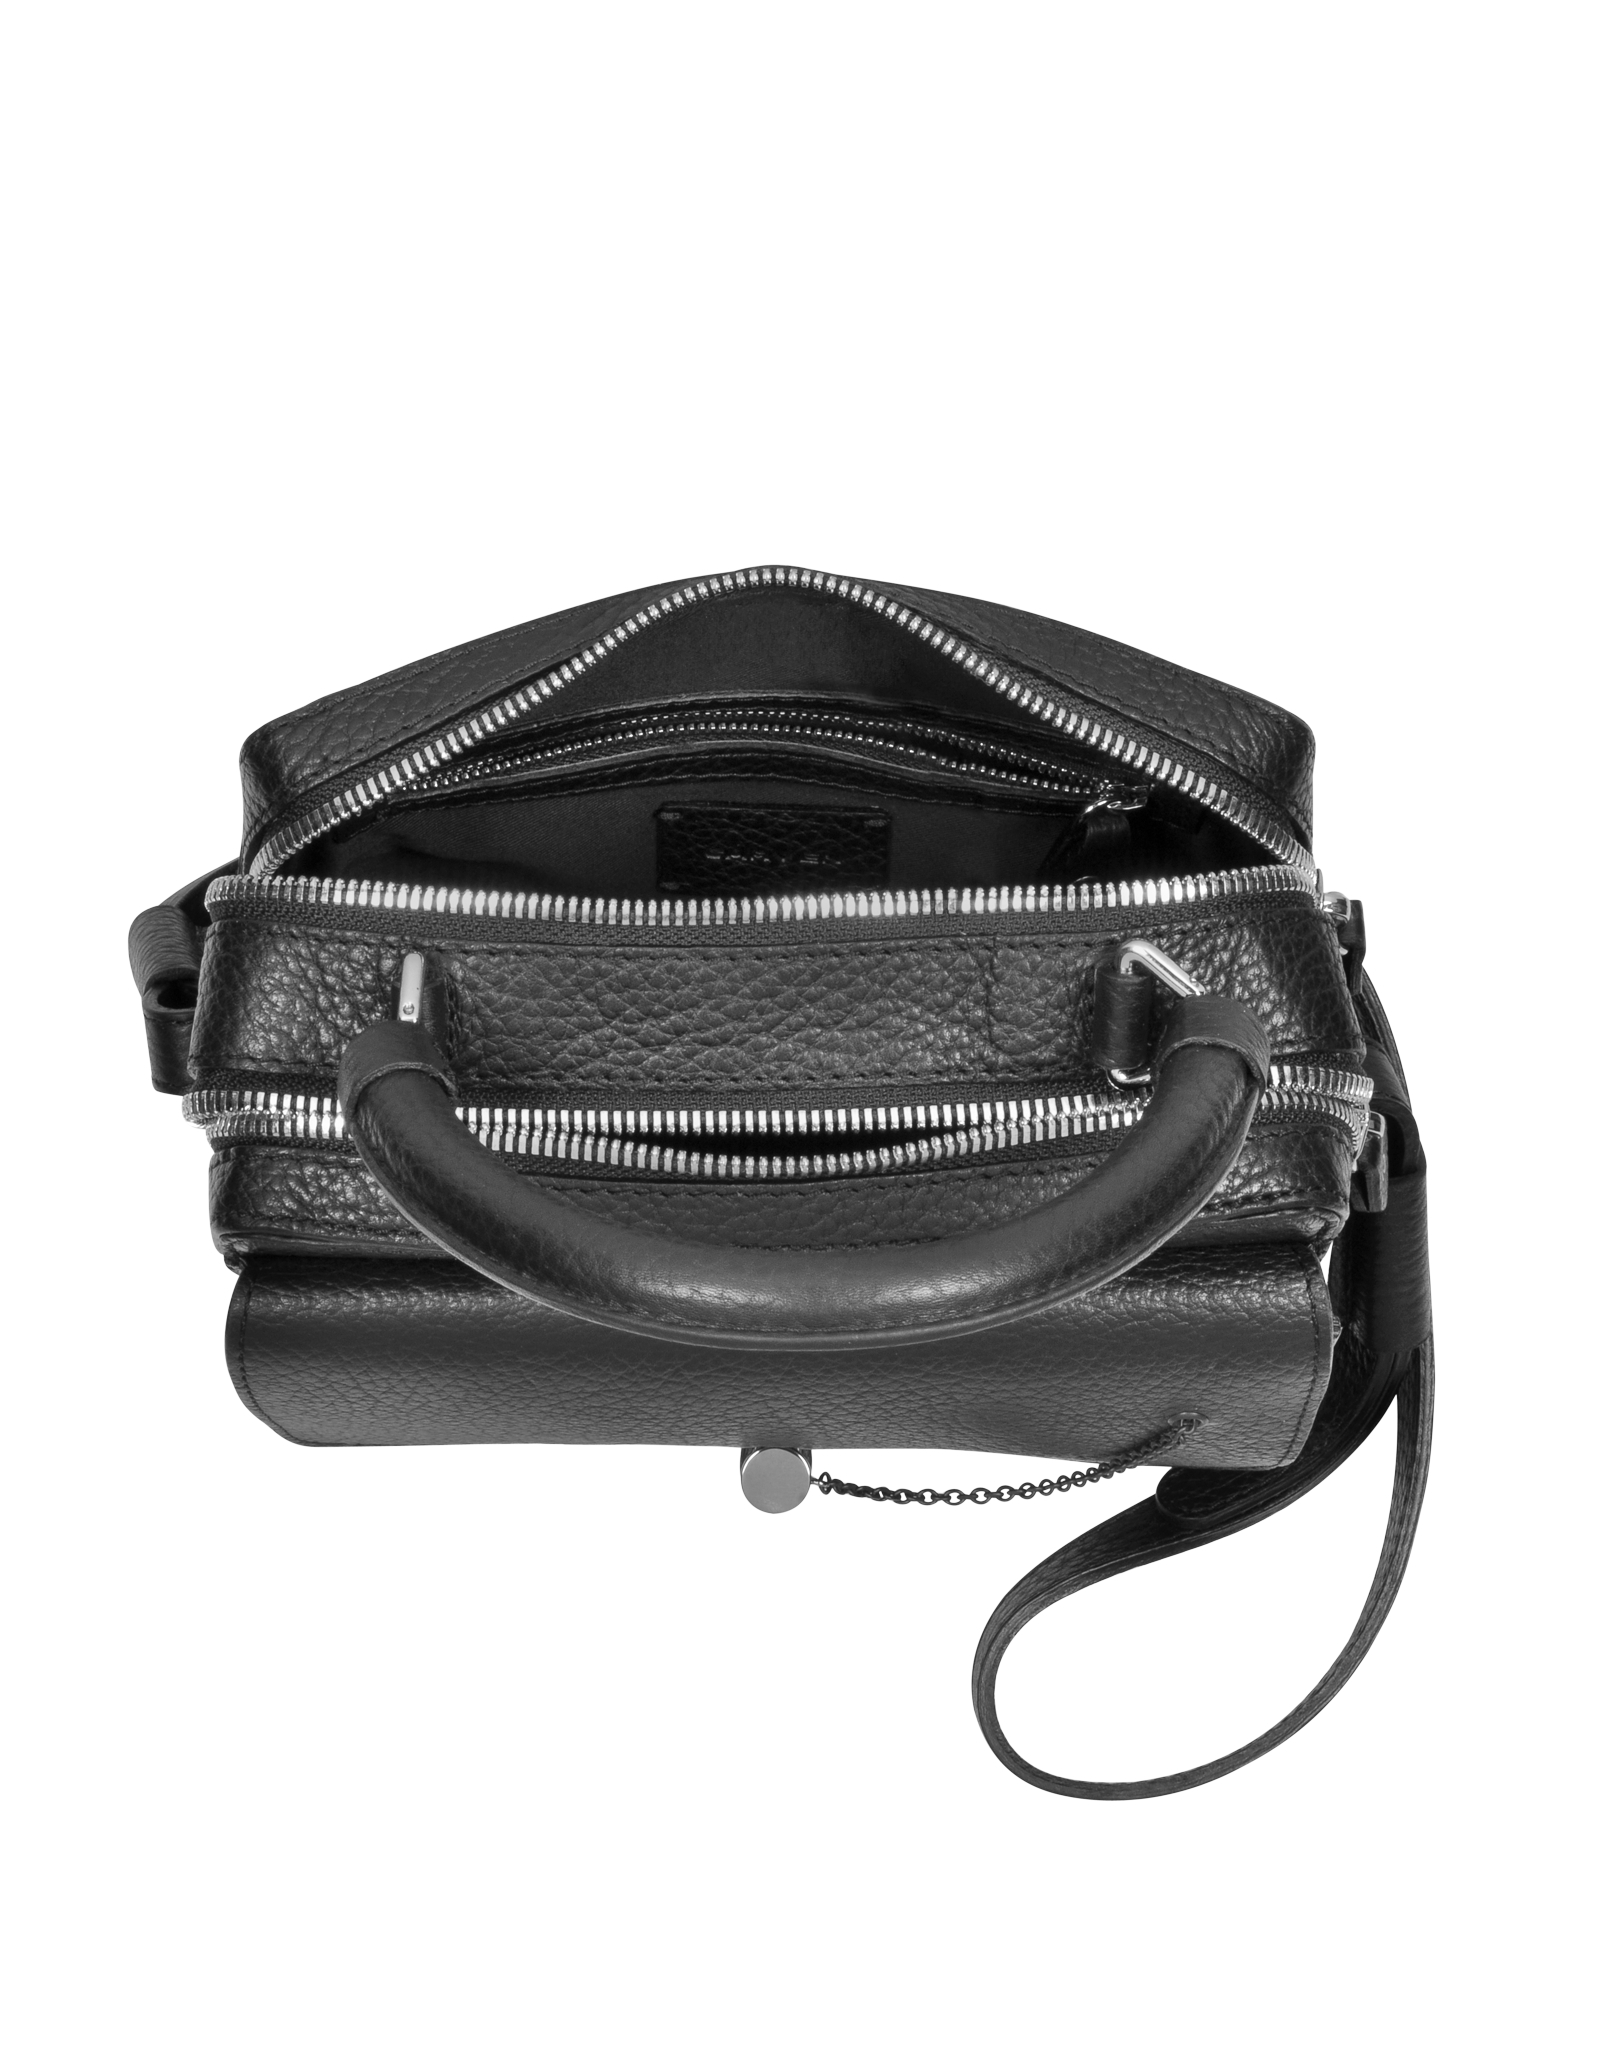 e0a5c854cb0 Carven Malher Petit Black Leather Camera Bag in Black - Lyst